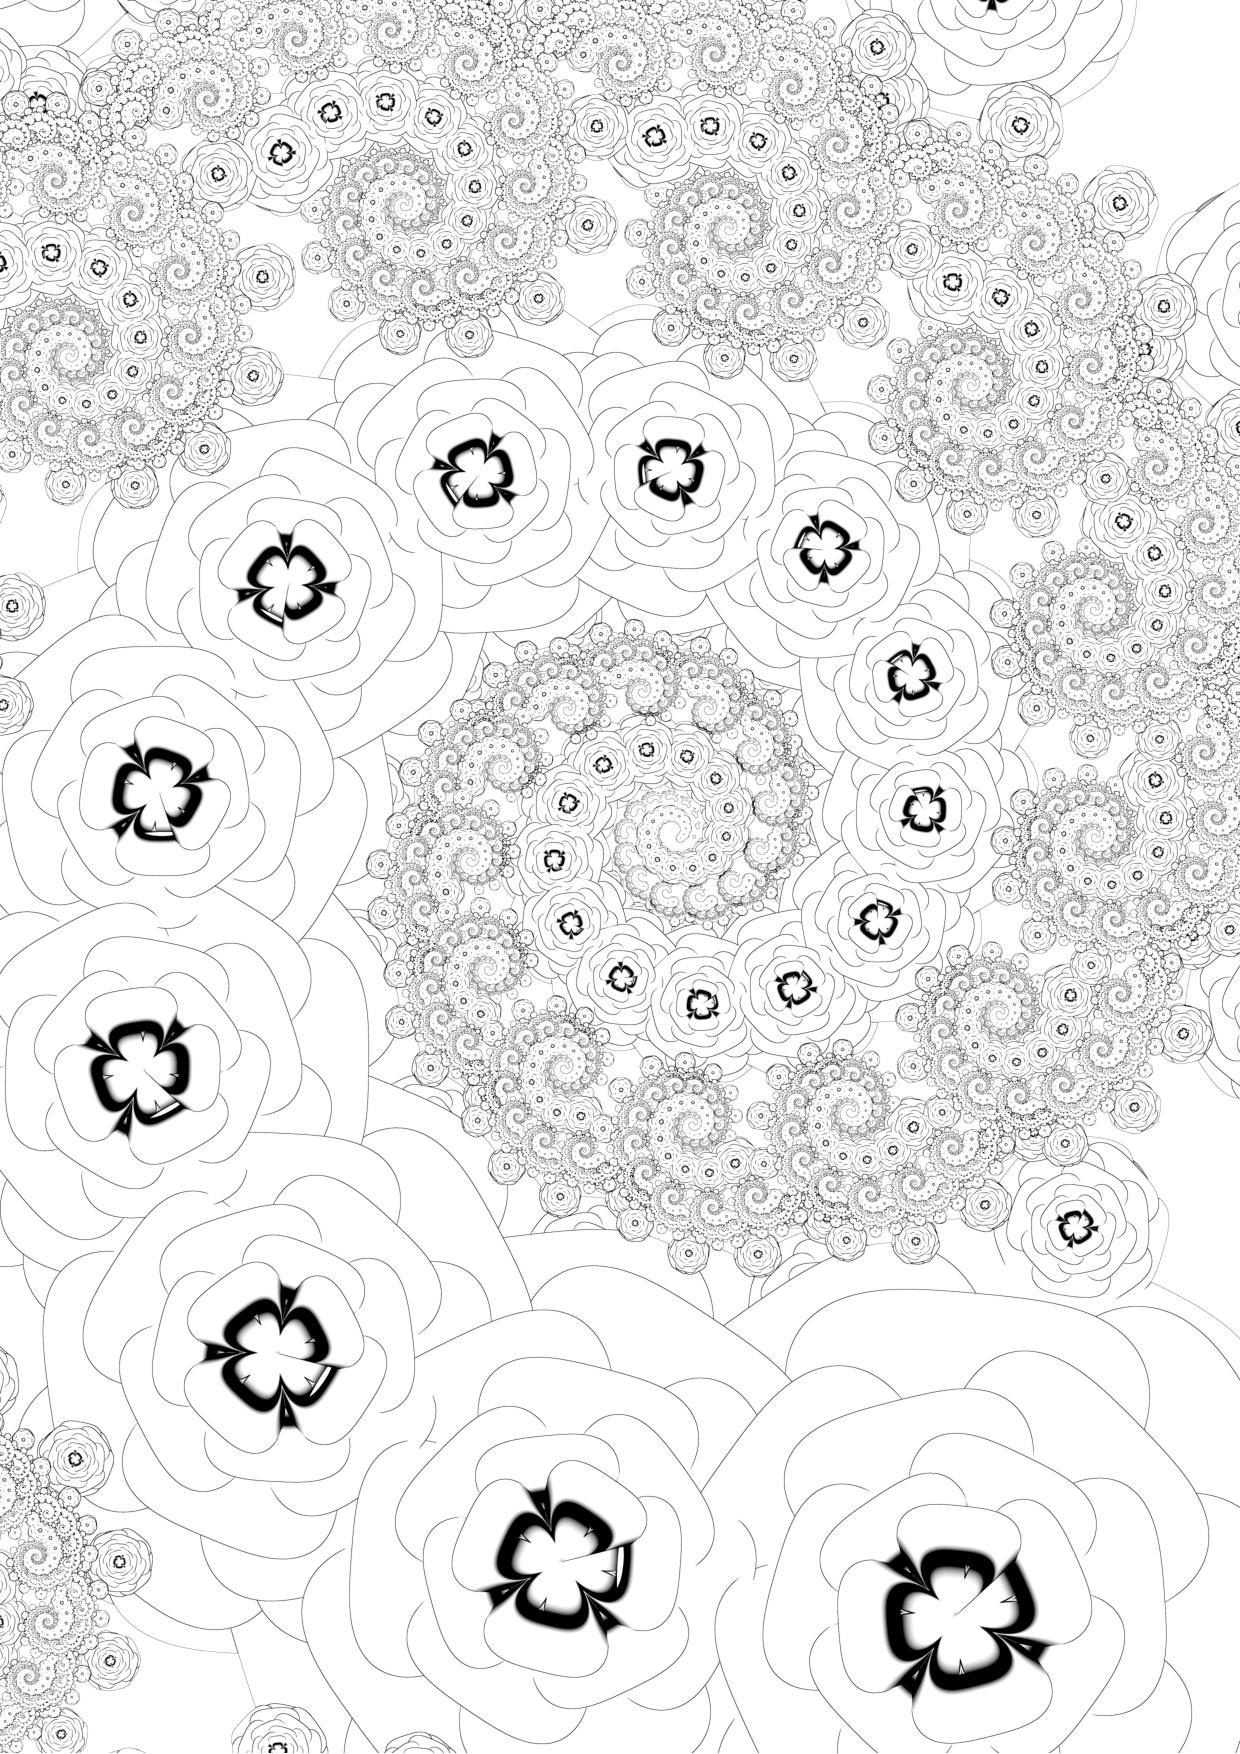 Colouring sheet - flower spiral